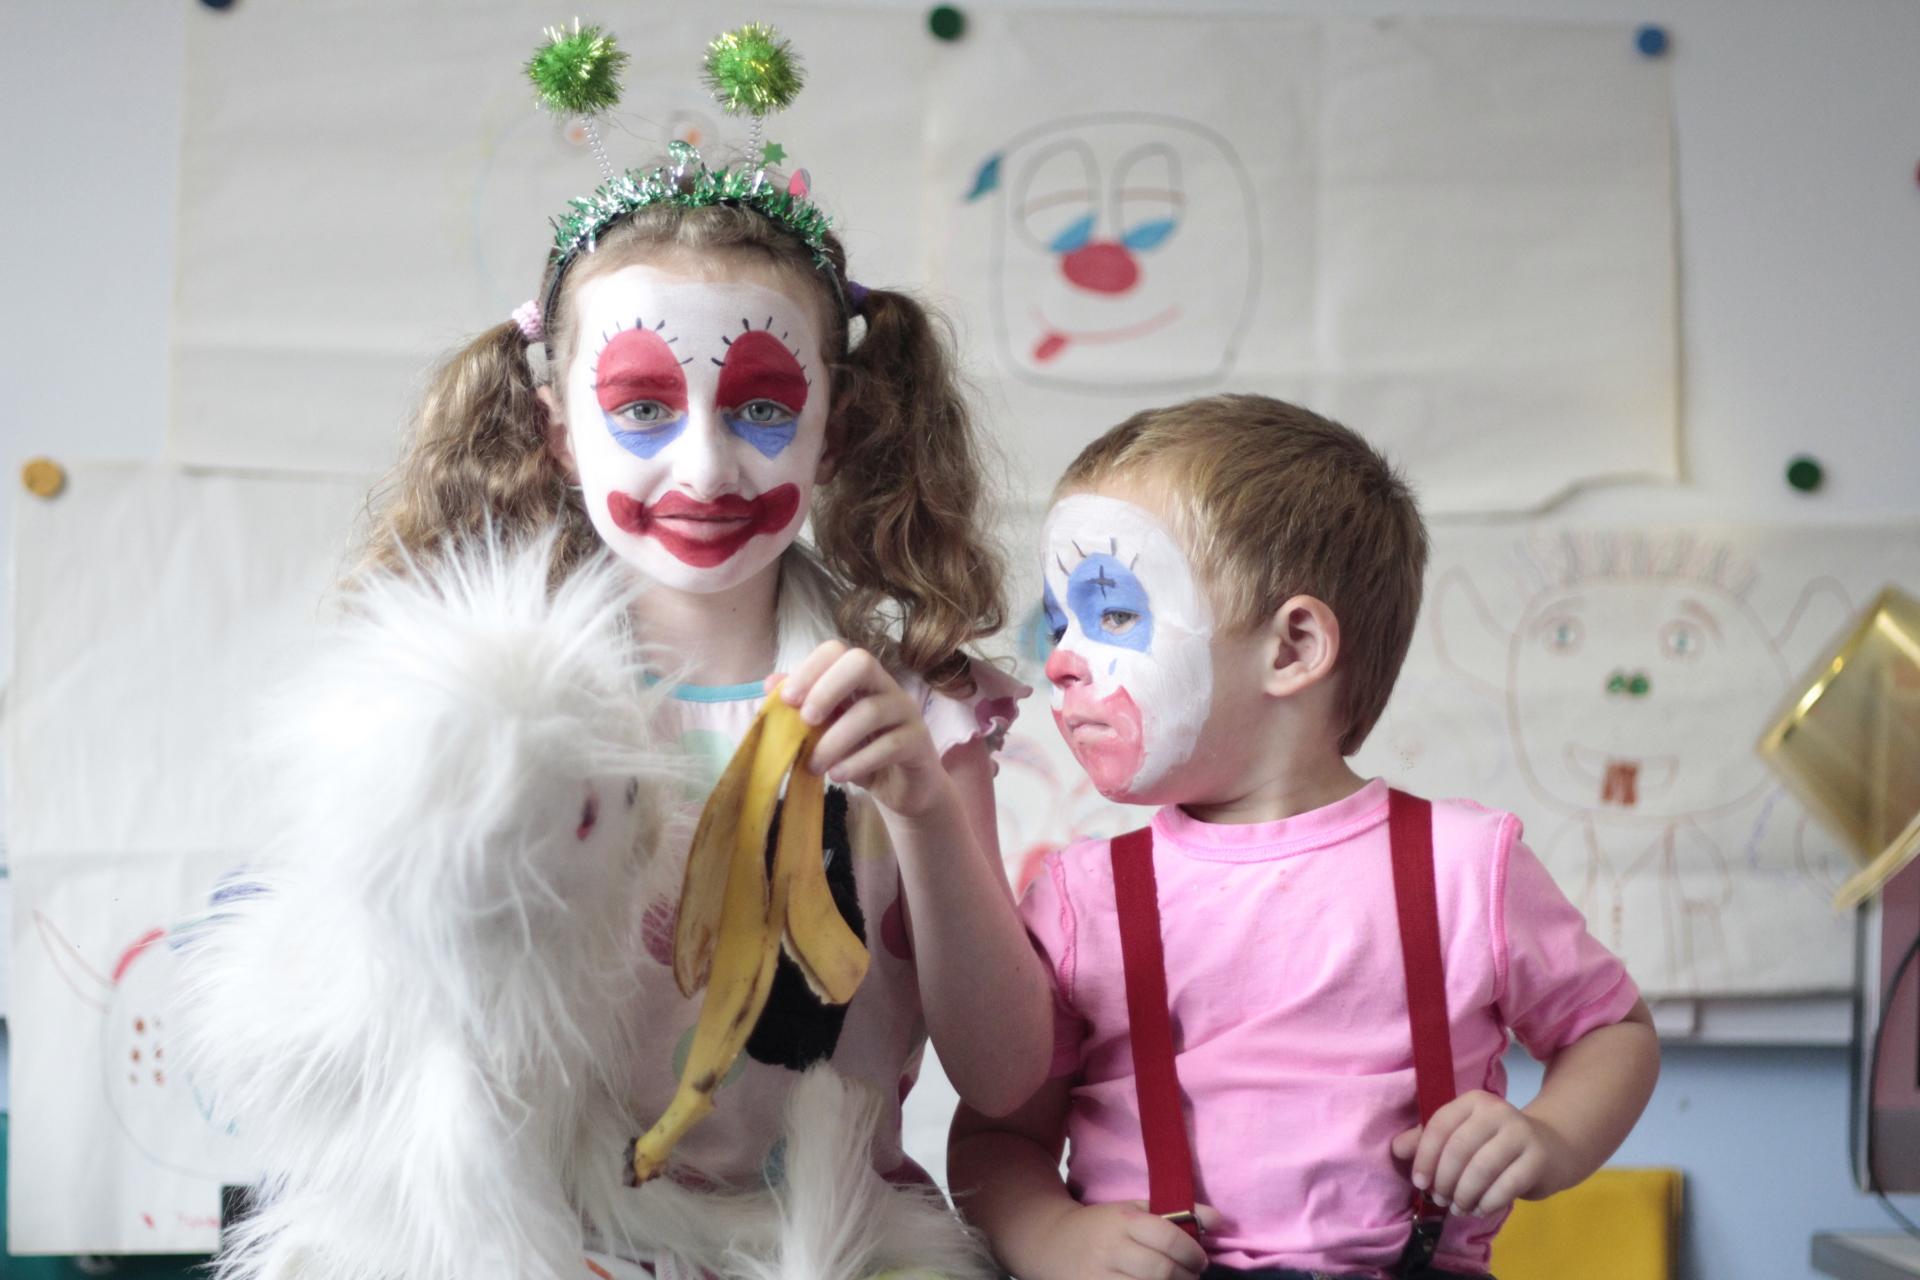 Clown School an anti-bullying workshop